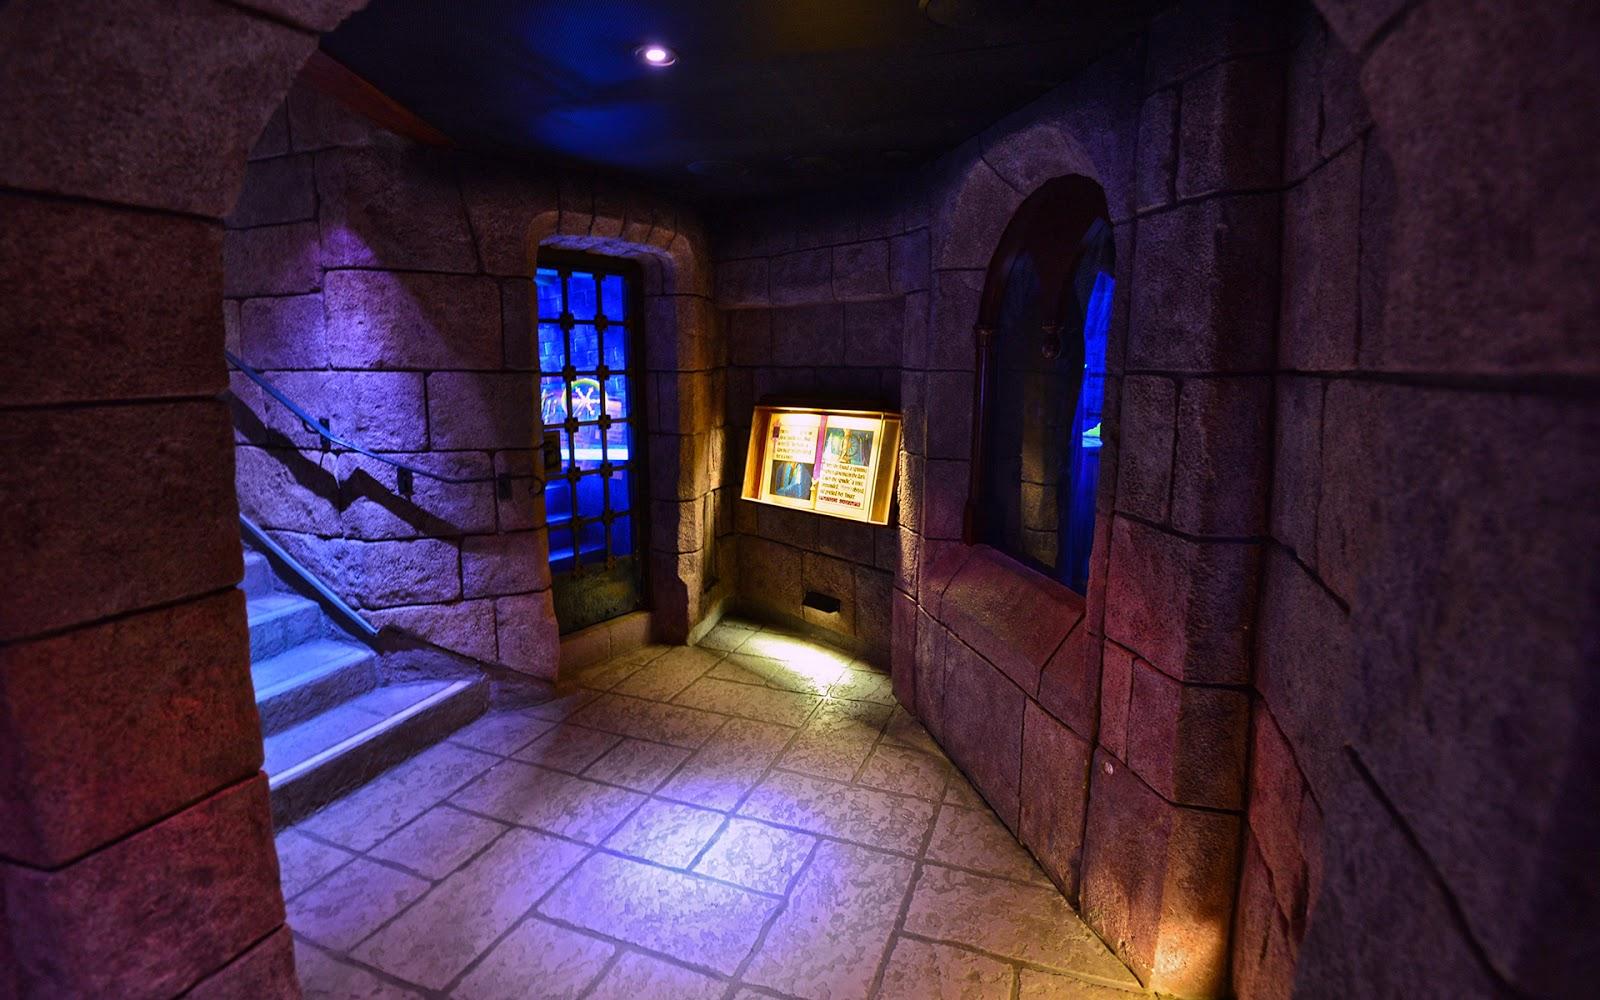 King Falls Am Wallpaper Sleeping Beauty Castle Walkthrough